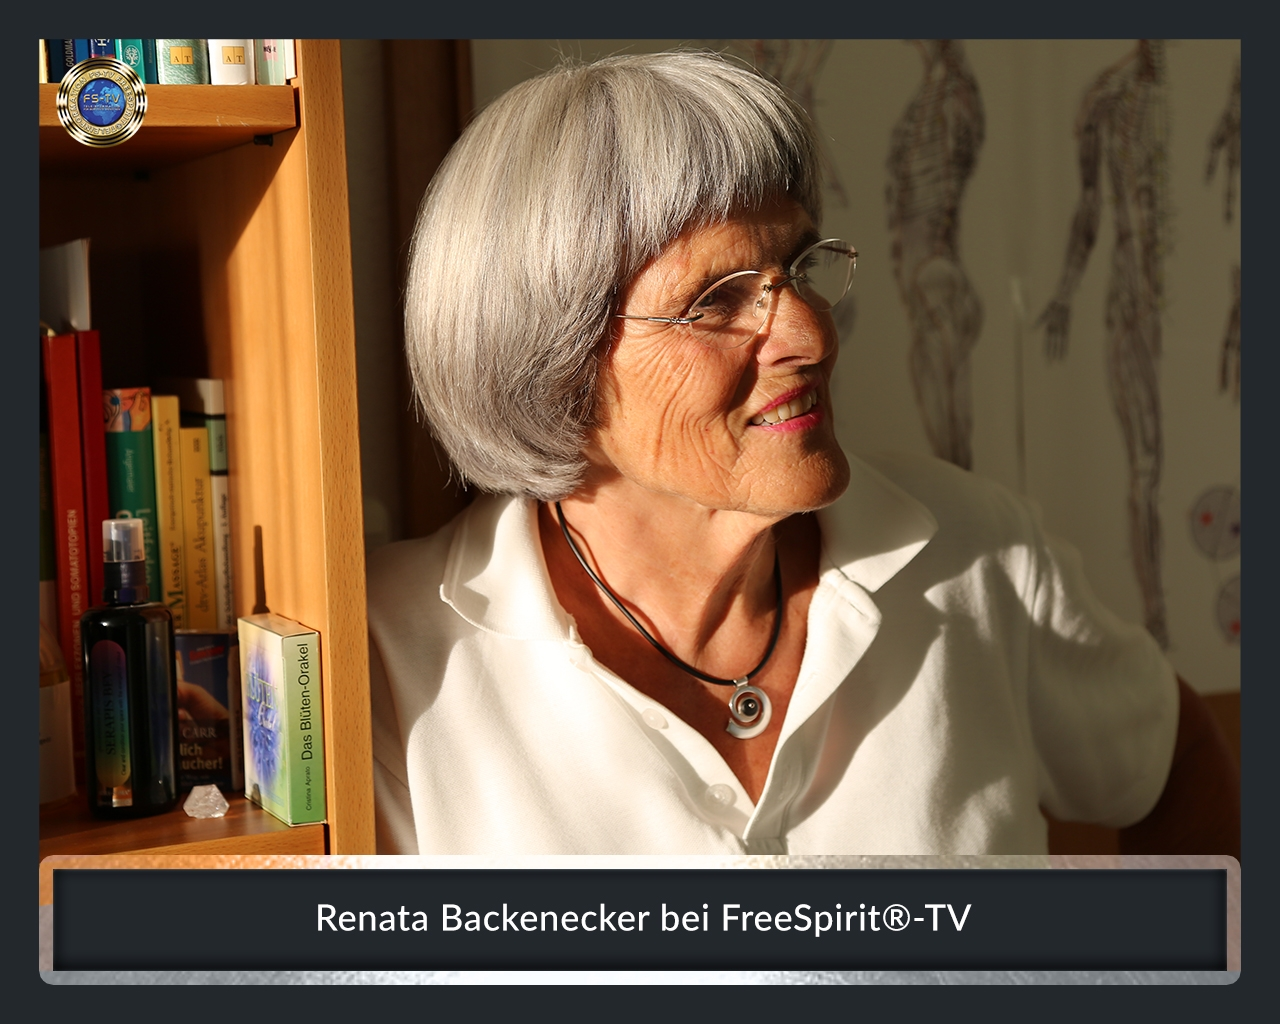 FS-TV-Bildergallerie-Renata-Backenecker-3